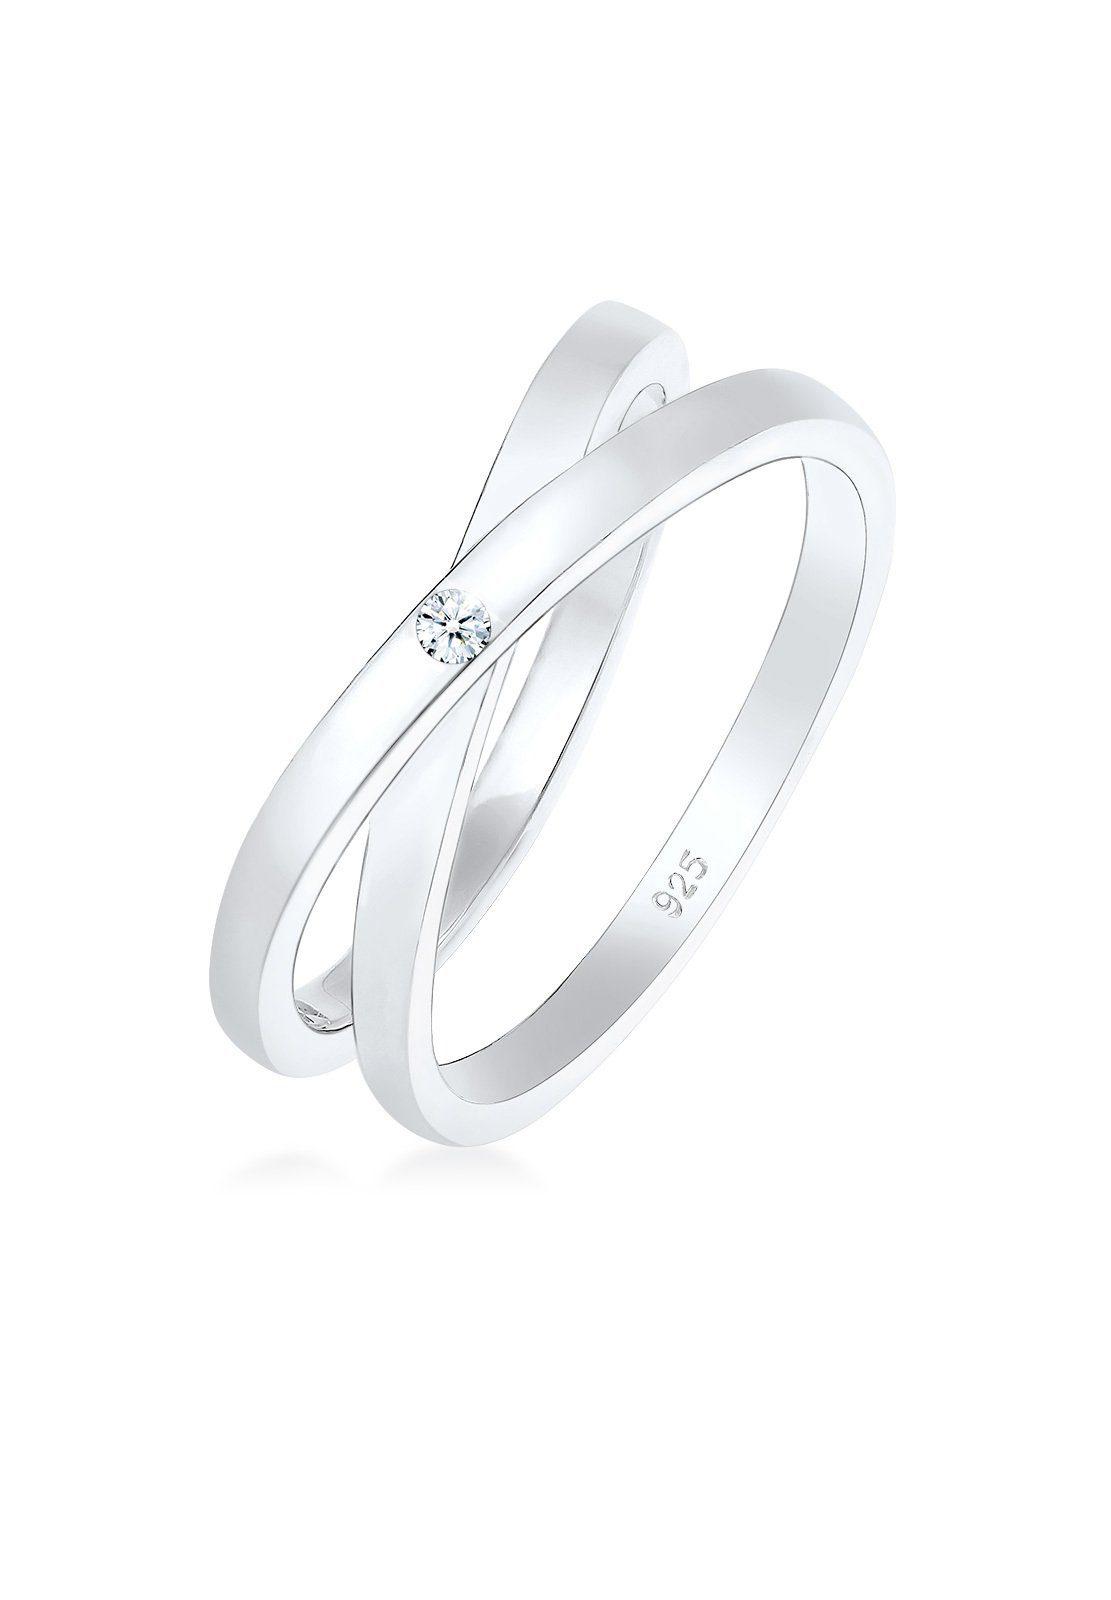 Diamore Diamantring Wickelring Cross Diamant (002 ct) 925 Silber   Schmuck > Ringe > Diamantringe   Diamore